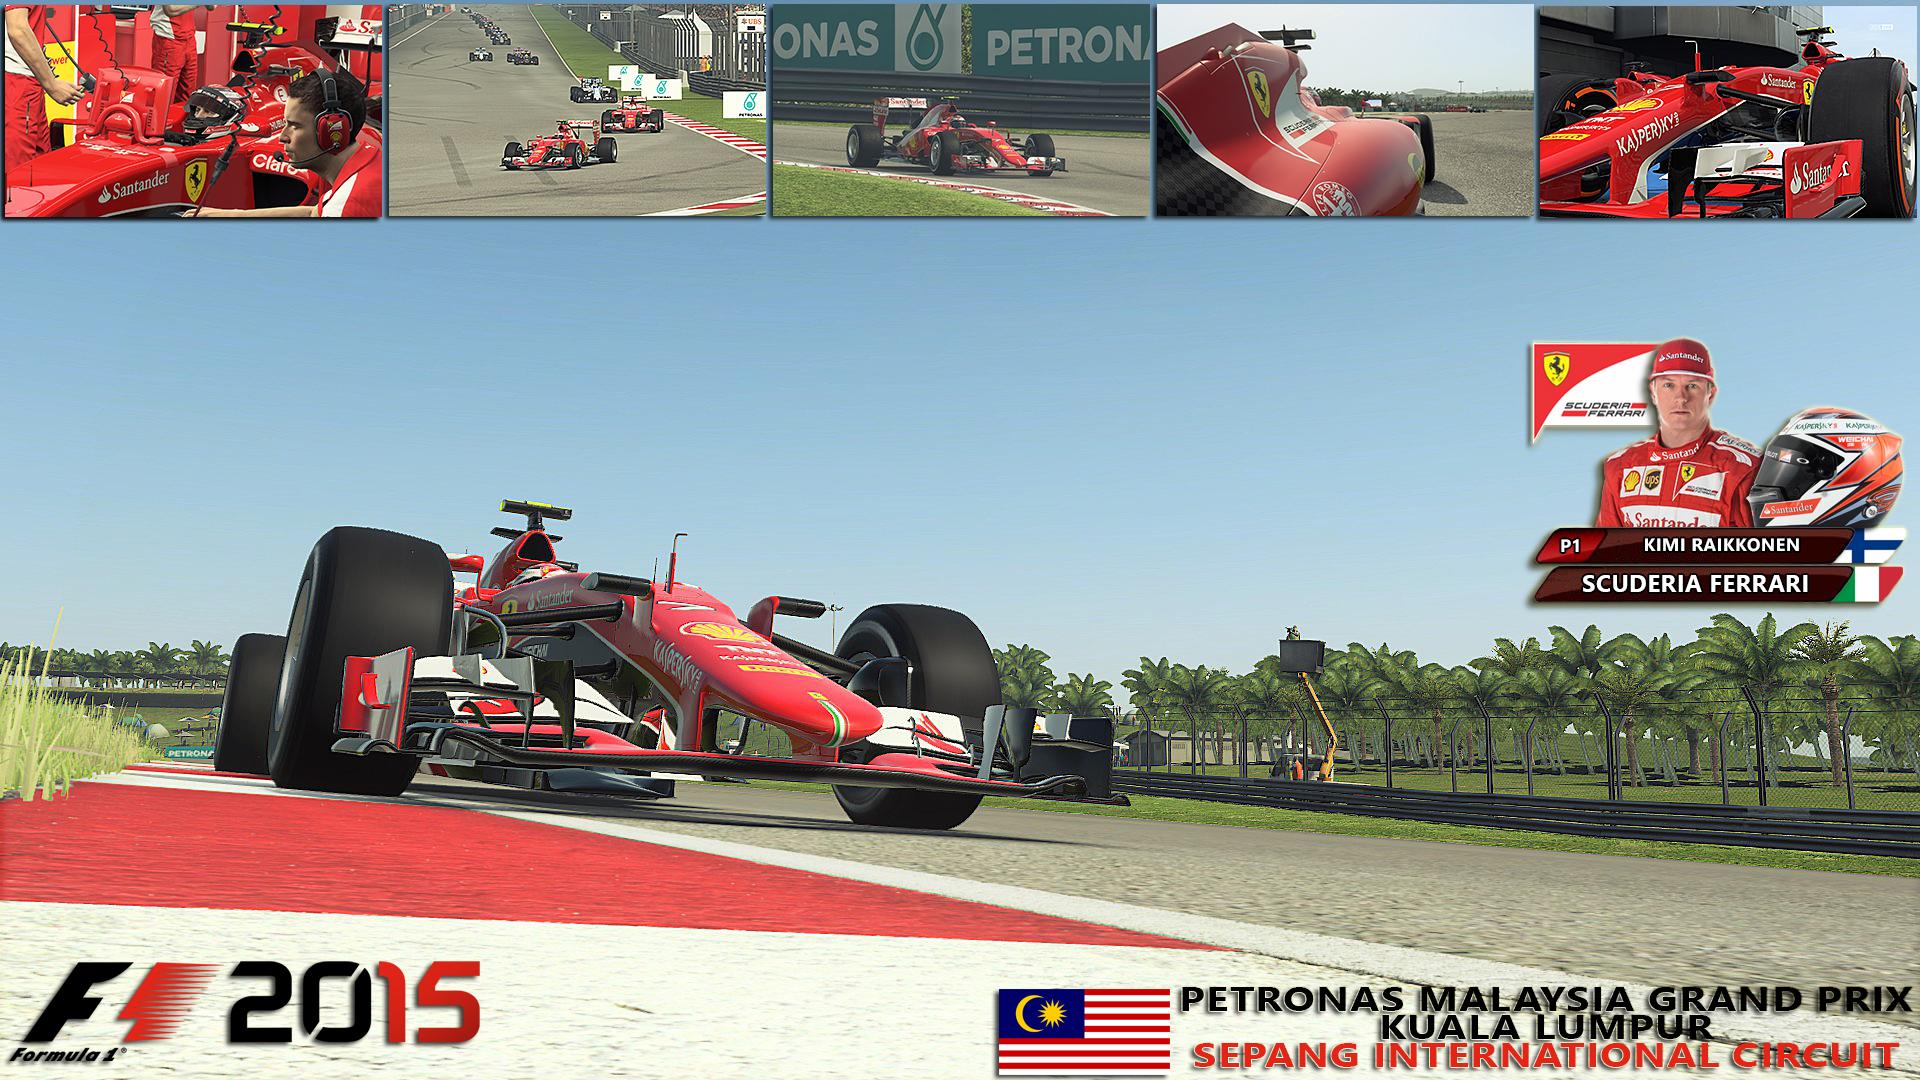 PETRONAS MALAYSIA GRAND PRIX Kuala Lumpur Sepang International Circuit